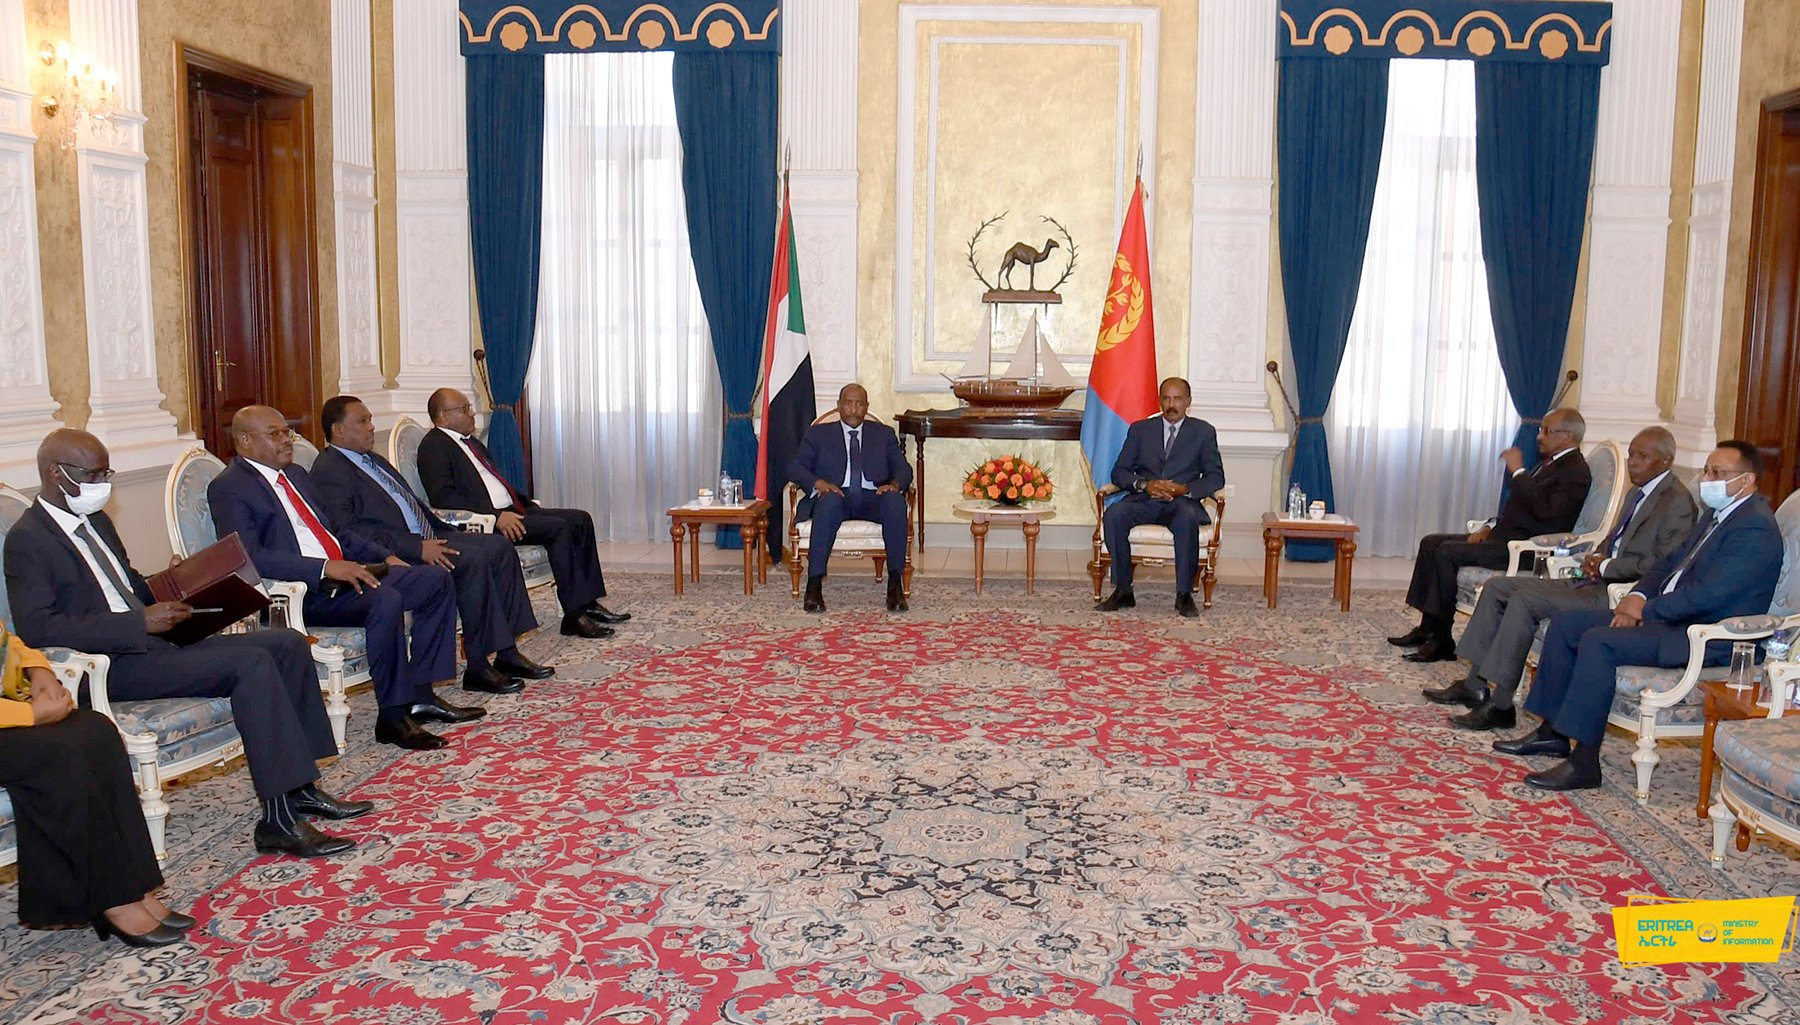 Sudan: Lt. Gen. Al-Burhan Arrives in Asmara for visit